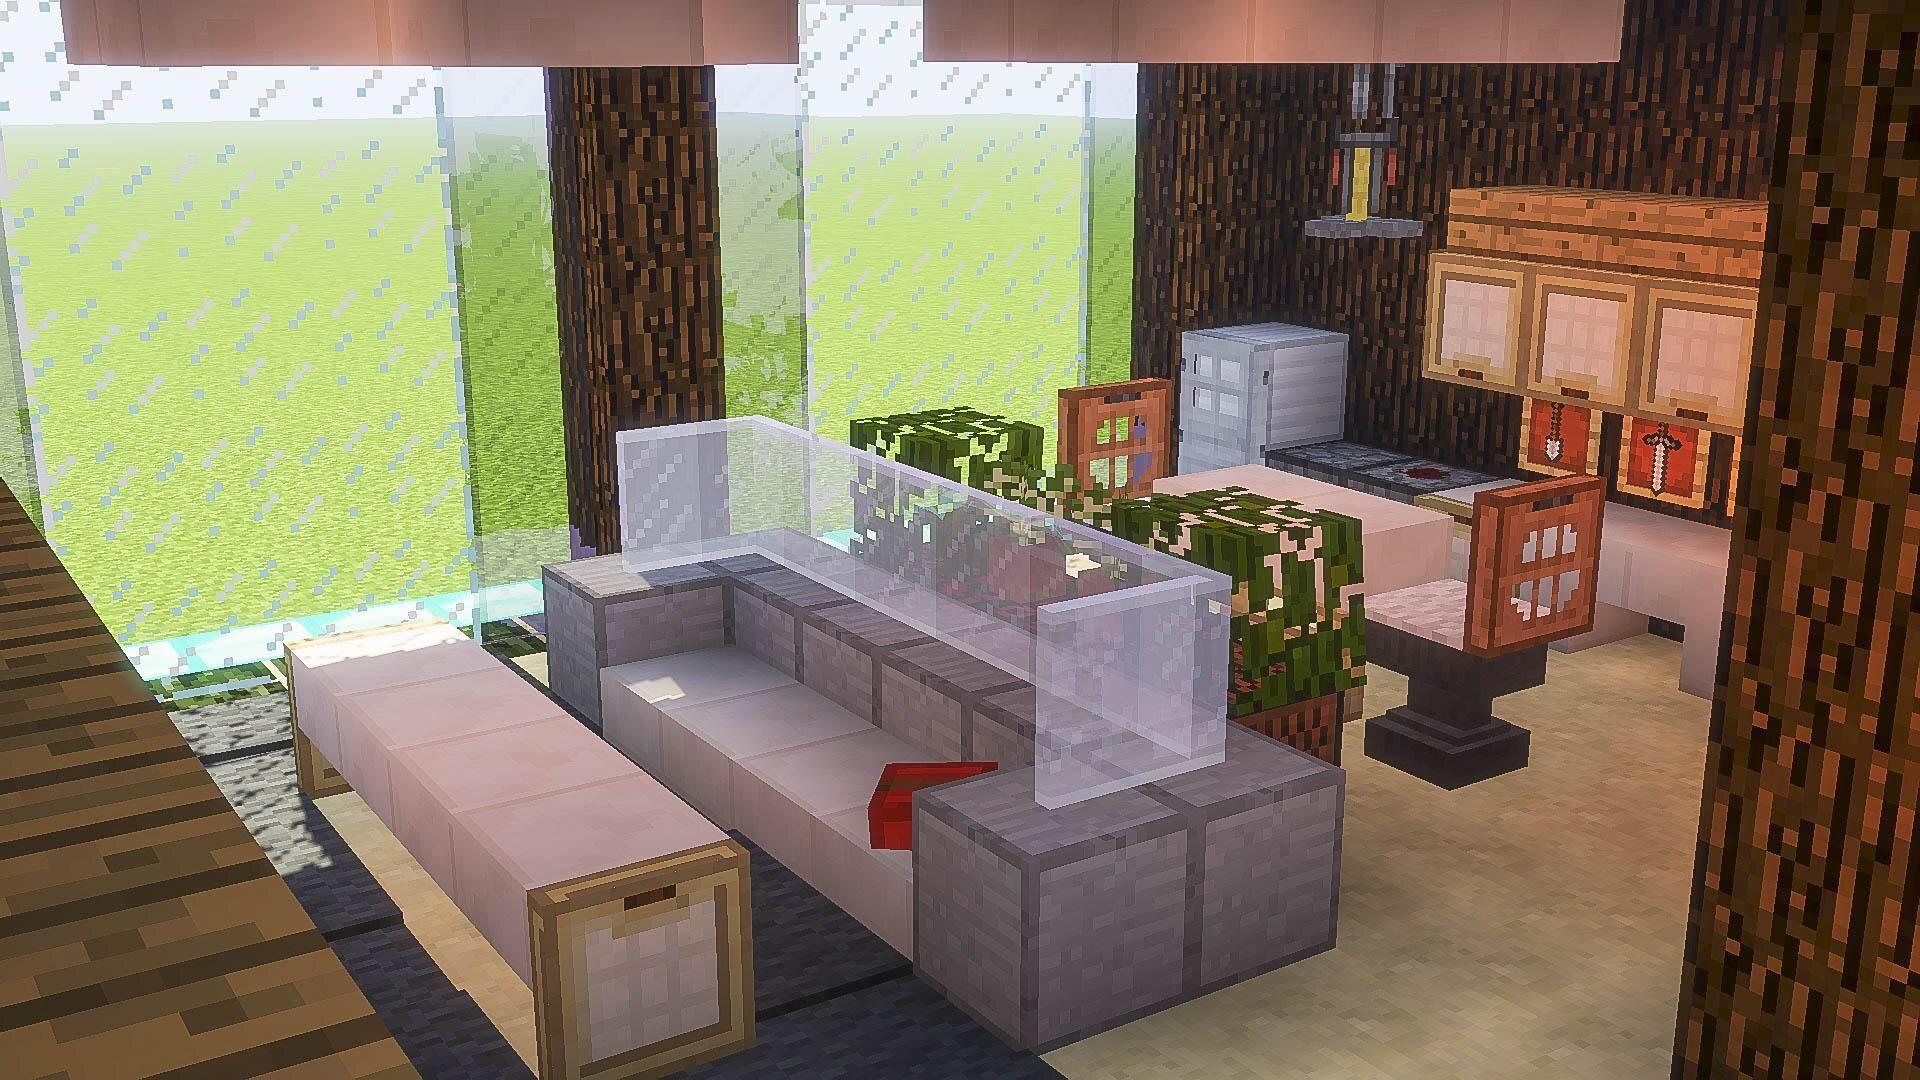 Utensil, coffee table  Minecraft interior design, Minecraft